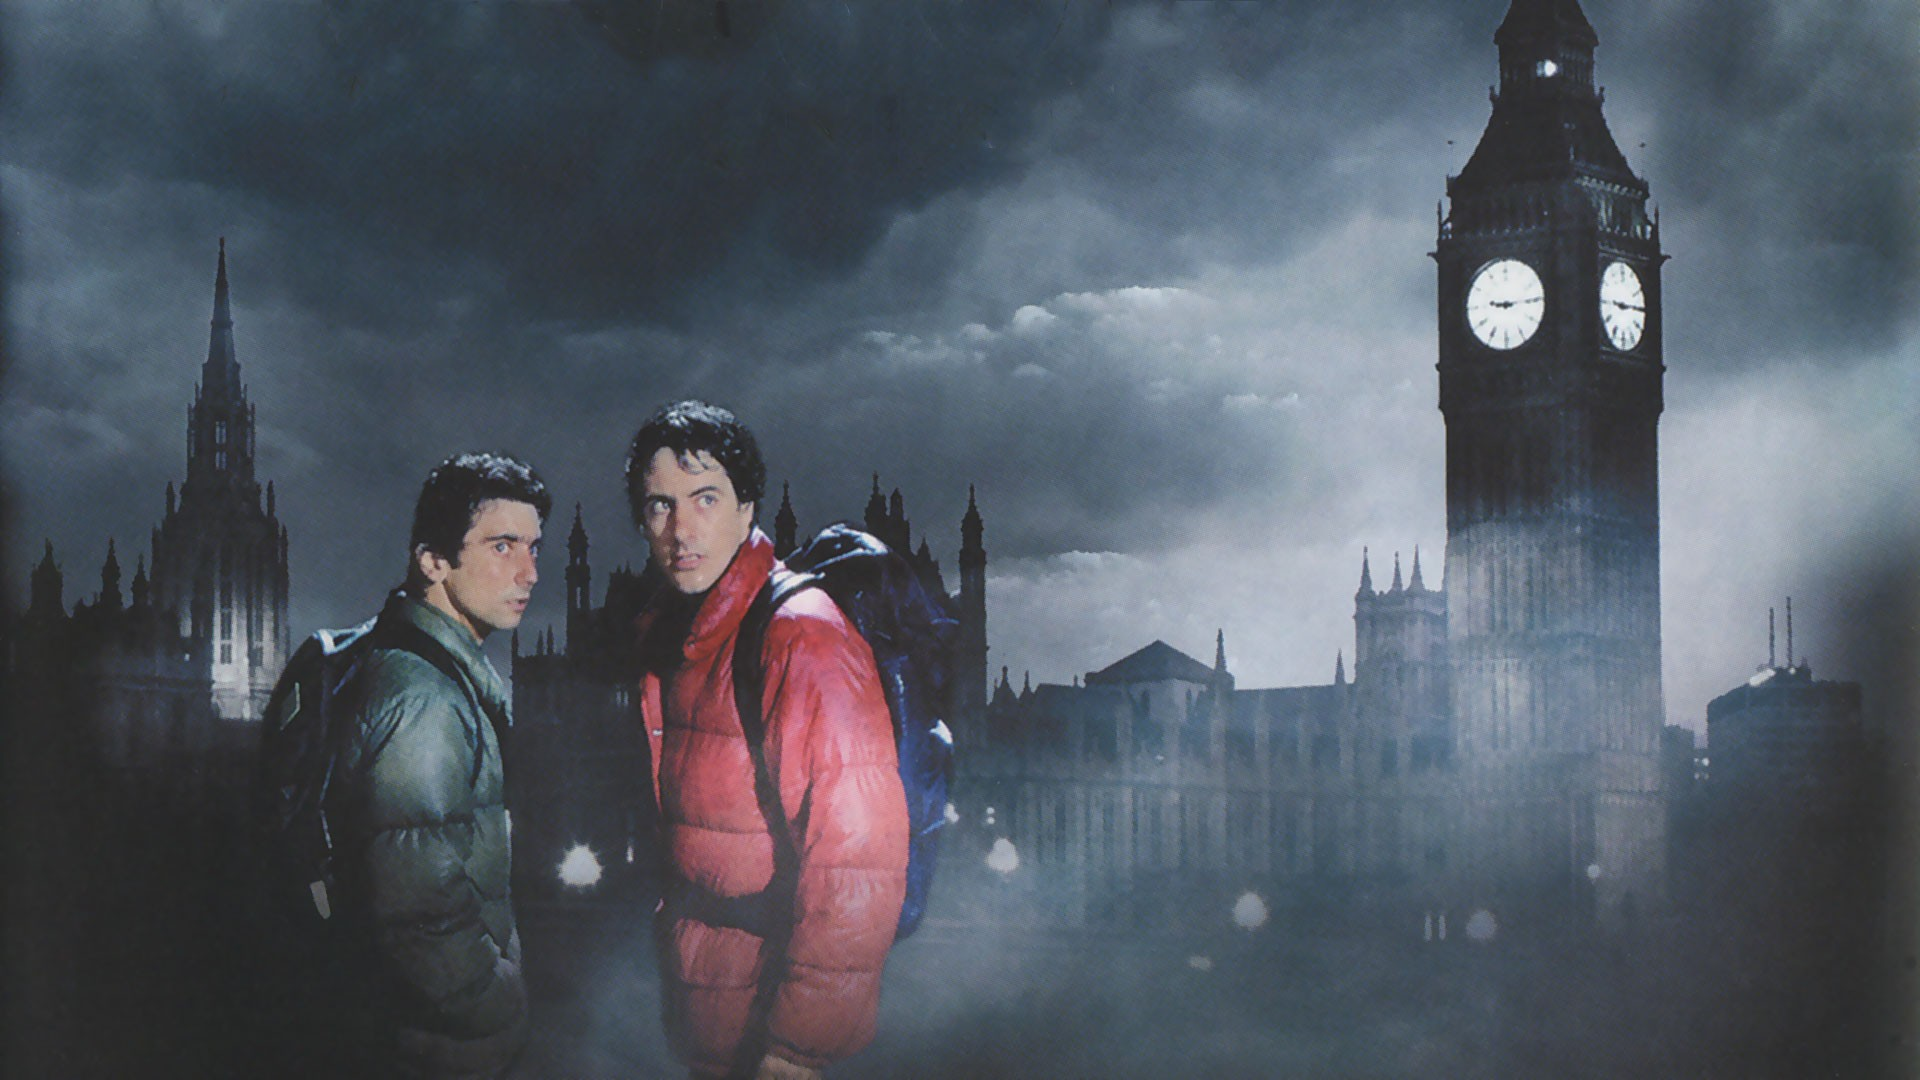 american-werewolf-in-london-banner.jpg